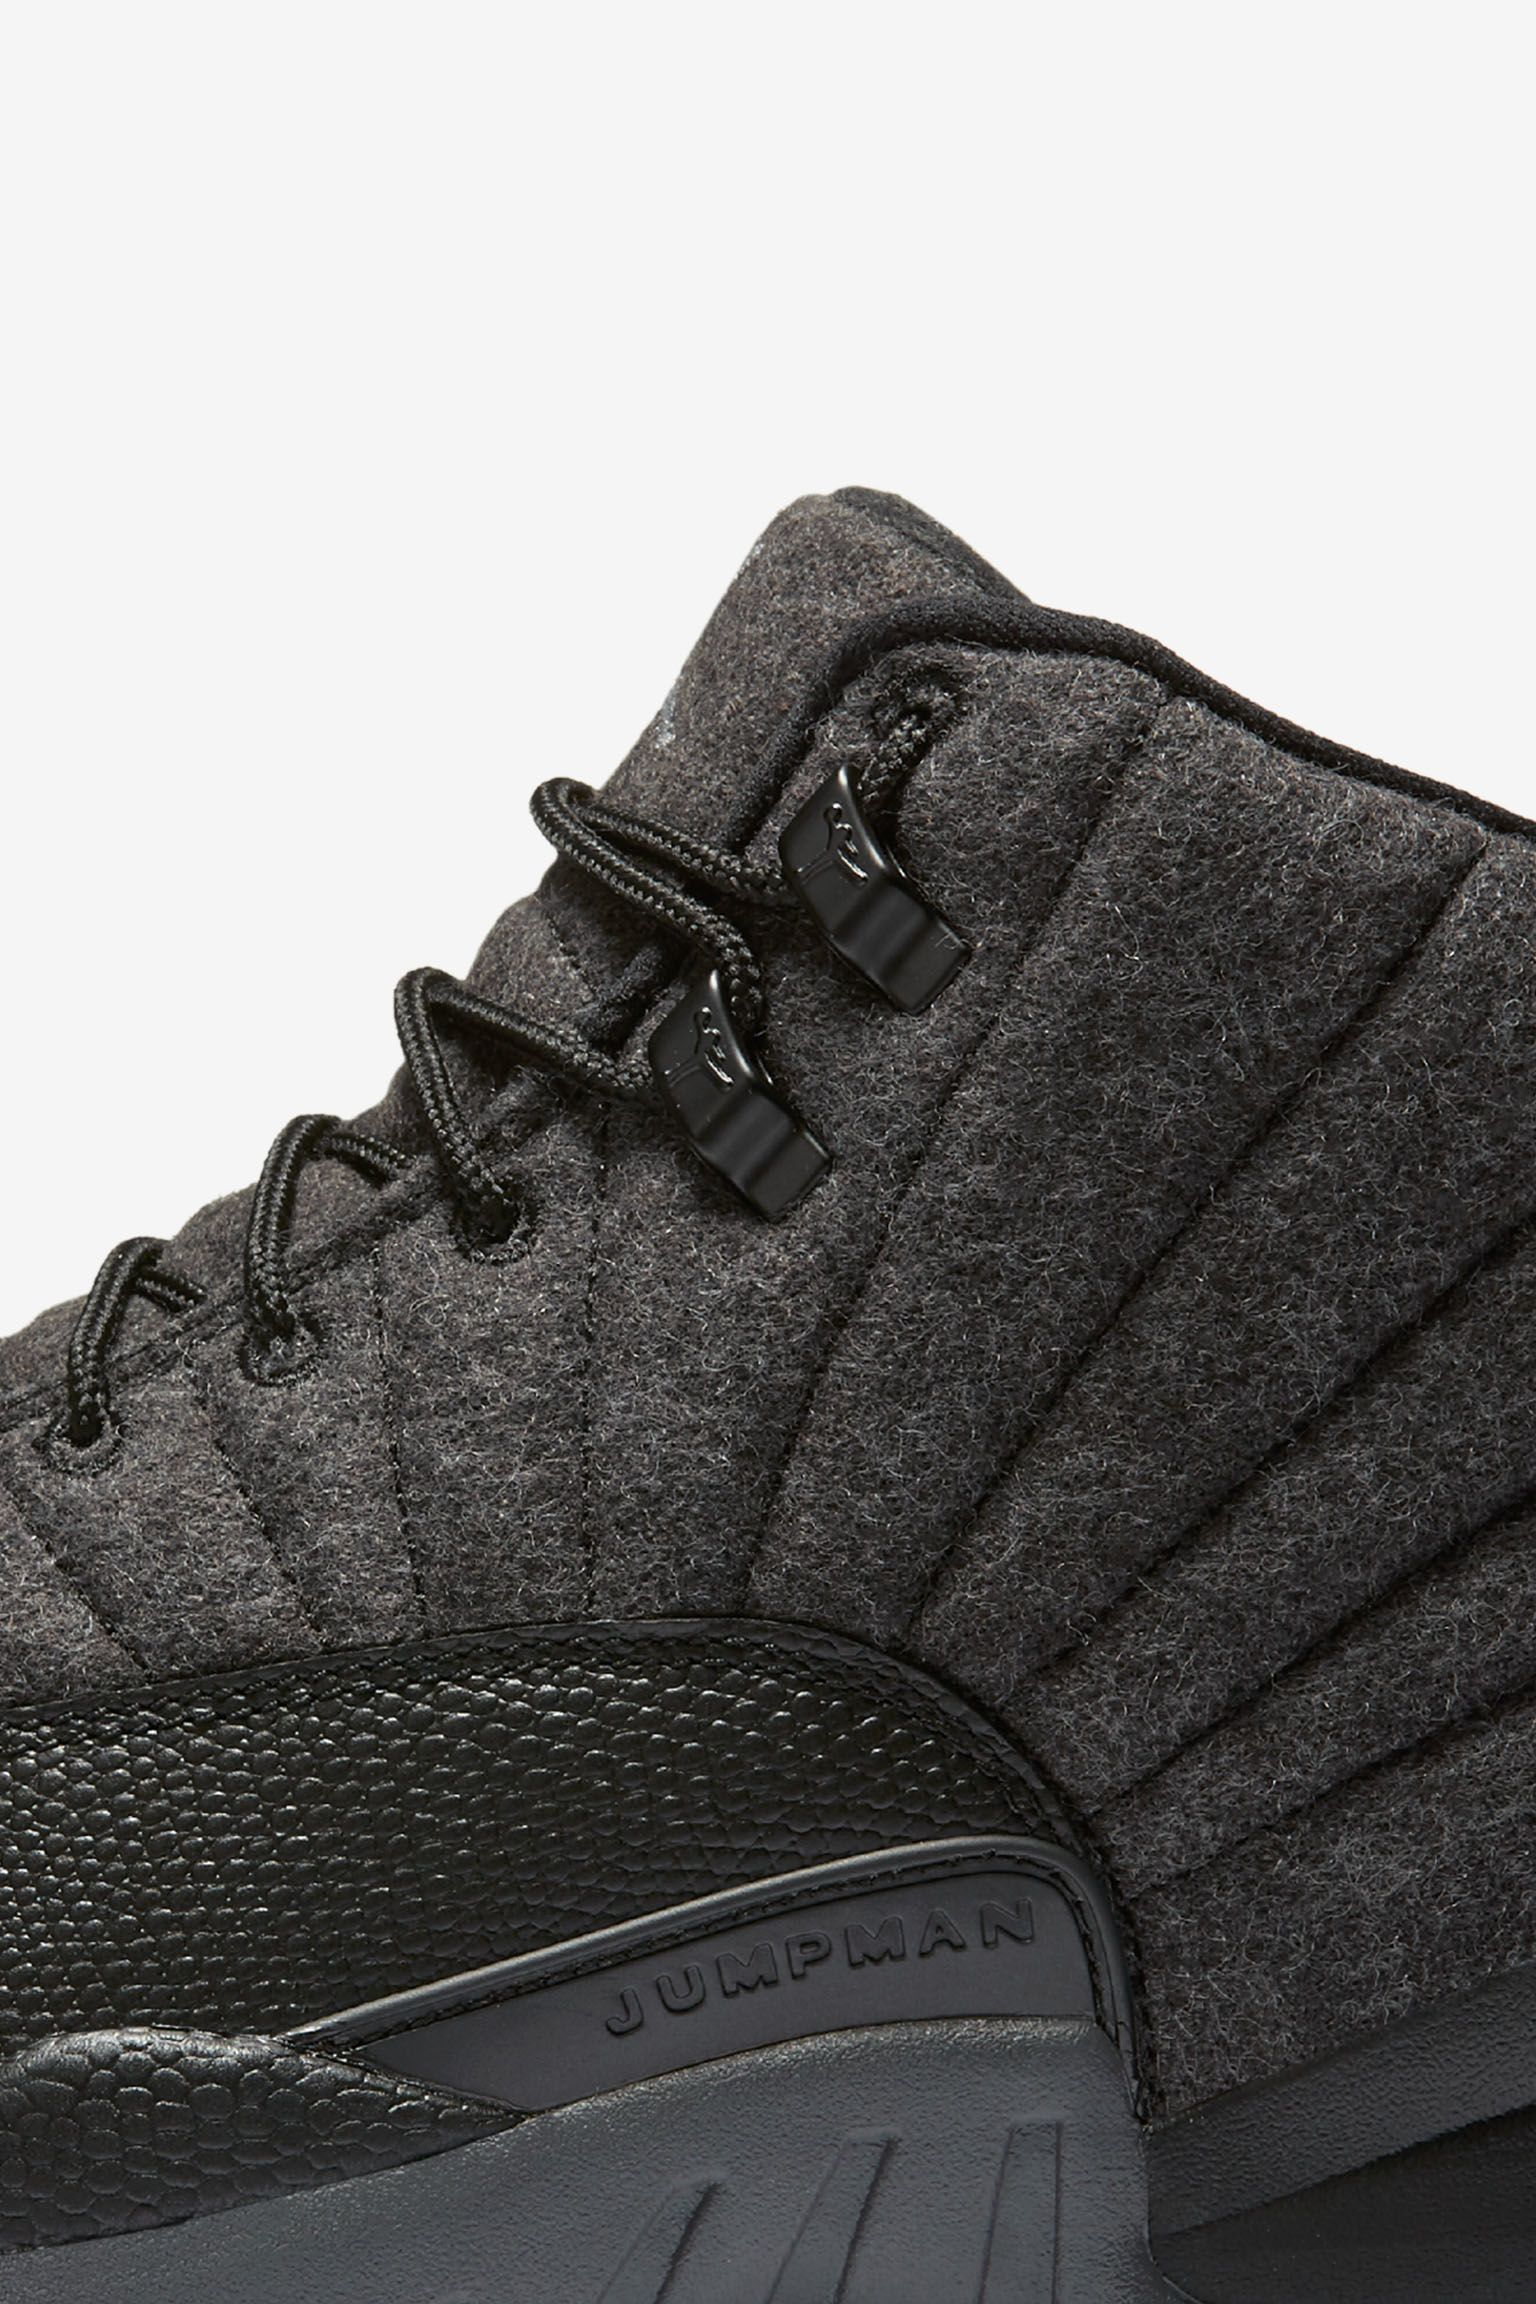 Air Jordan 12 Retro Wool 'Dark Grey & Black' Release Date